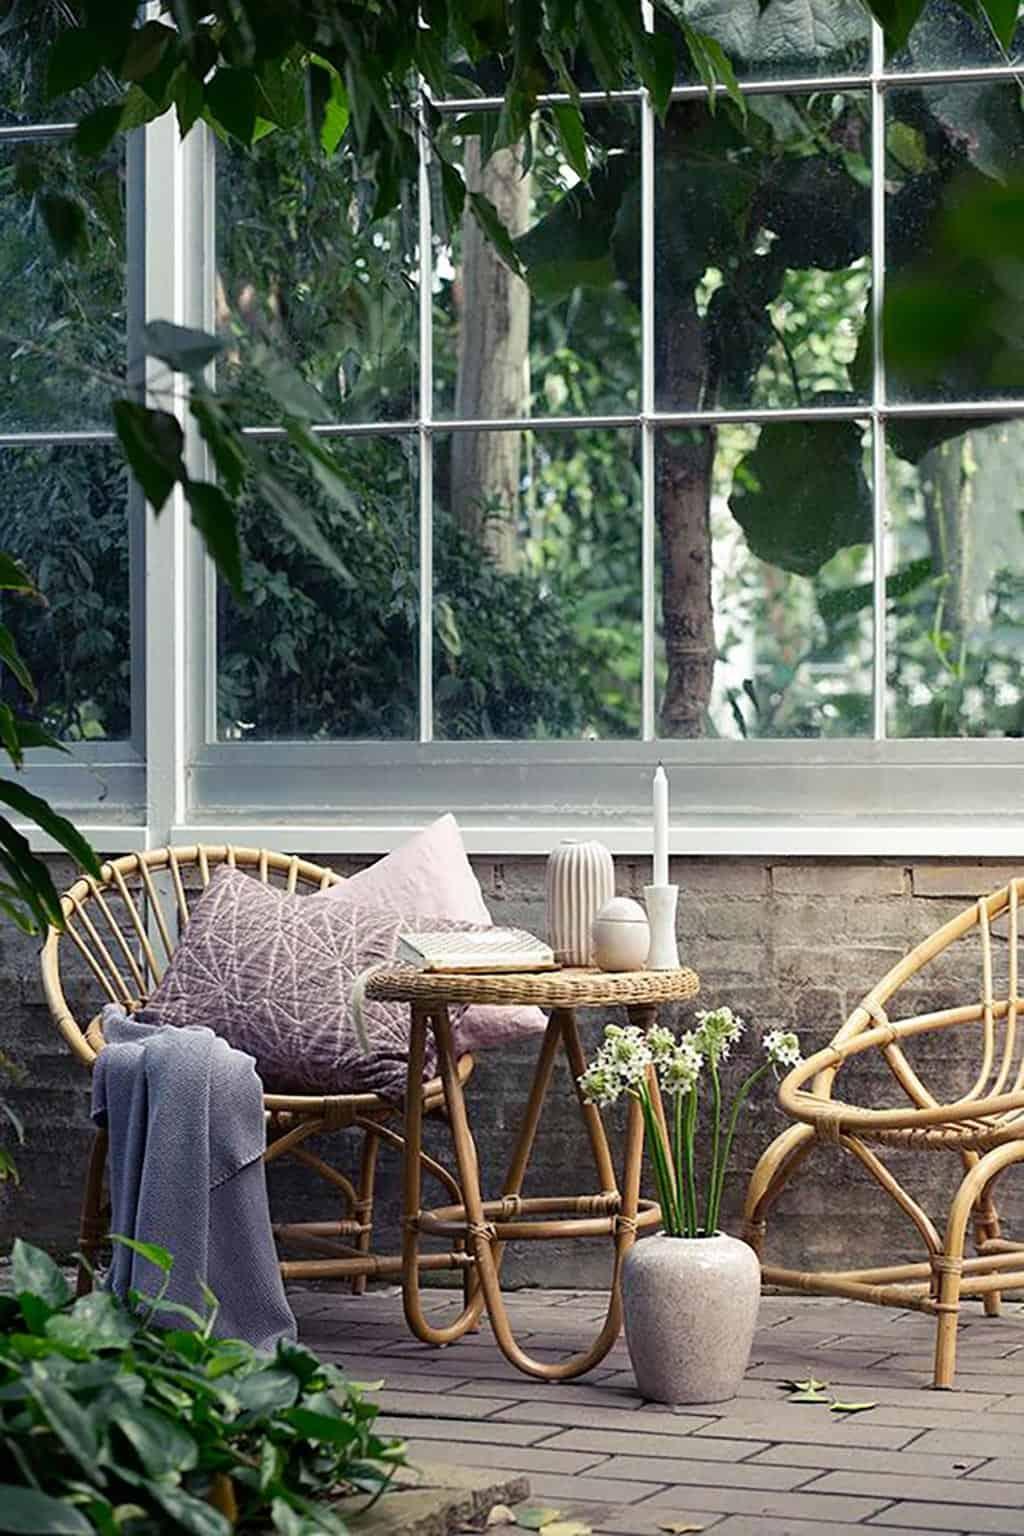 Muebles de mimbre para decorar tu terraza decoracion-jardines Blog Decoracion